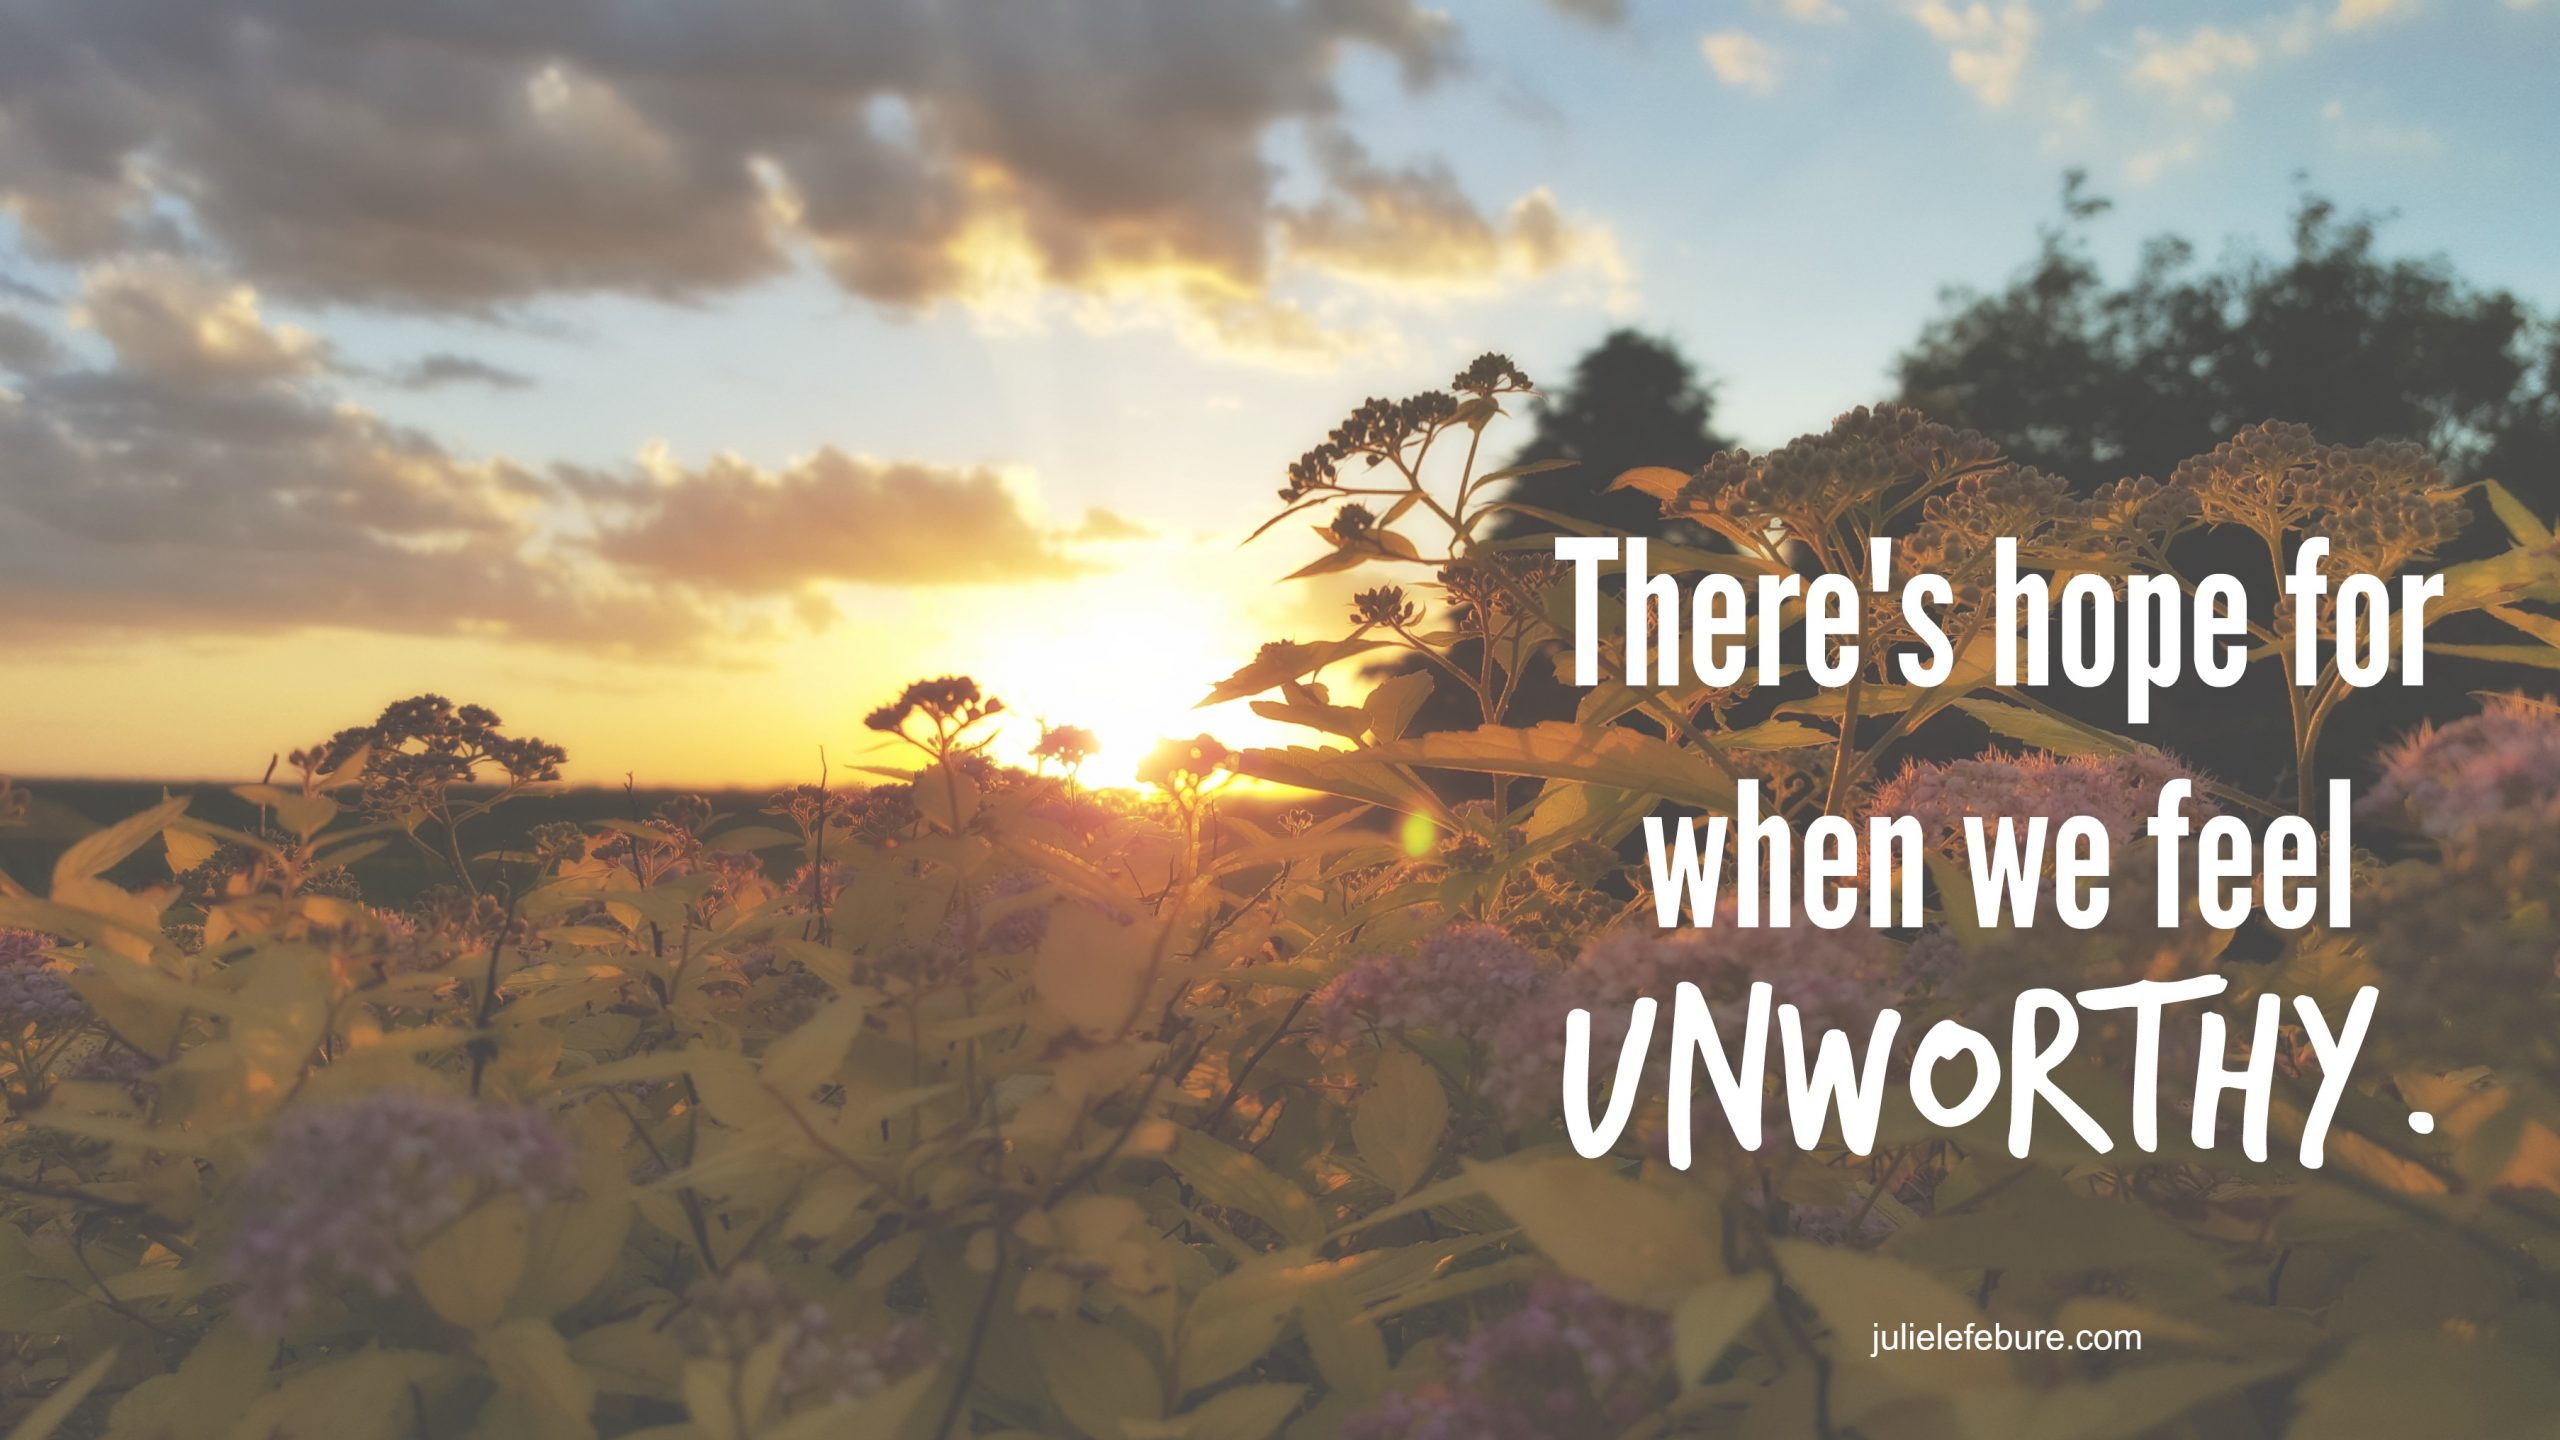 Has Rejection Left You Feeling Unworthy?